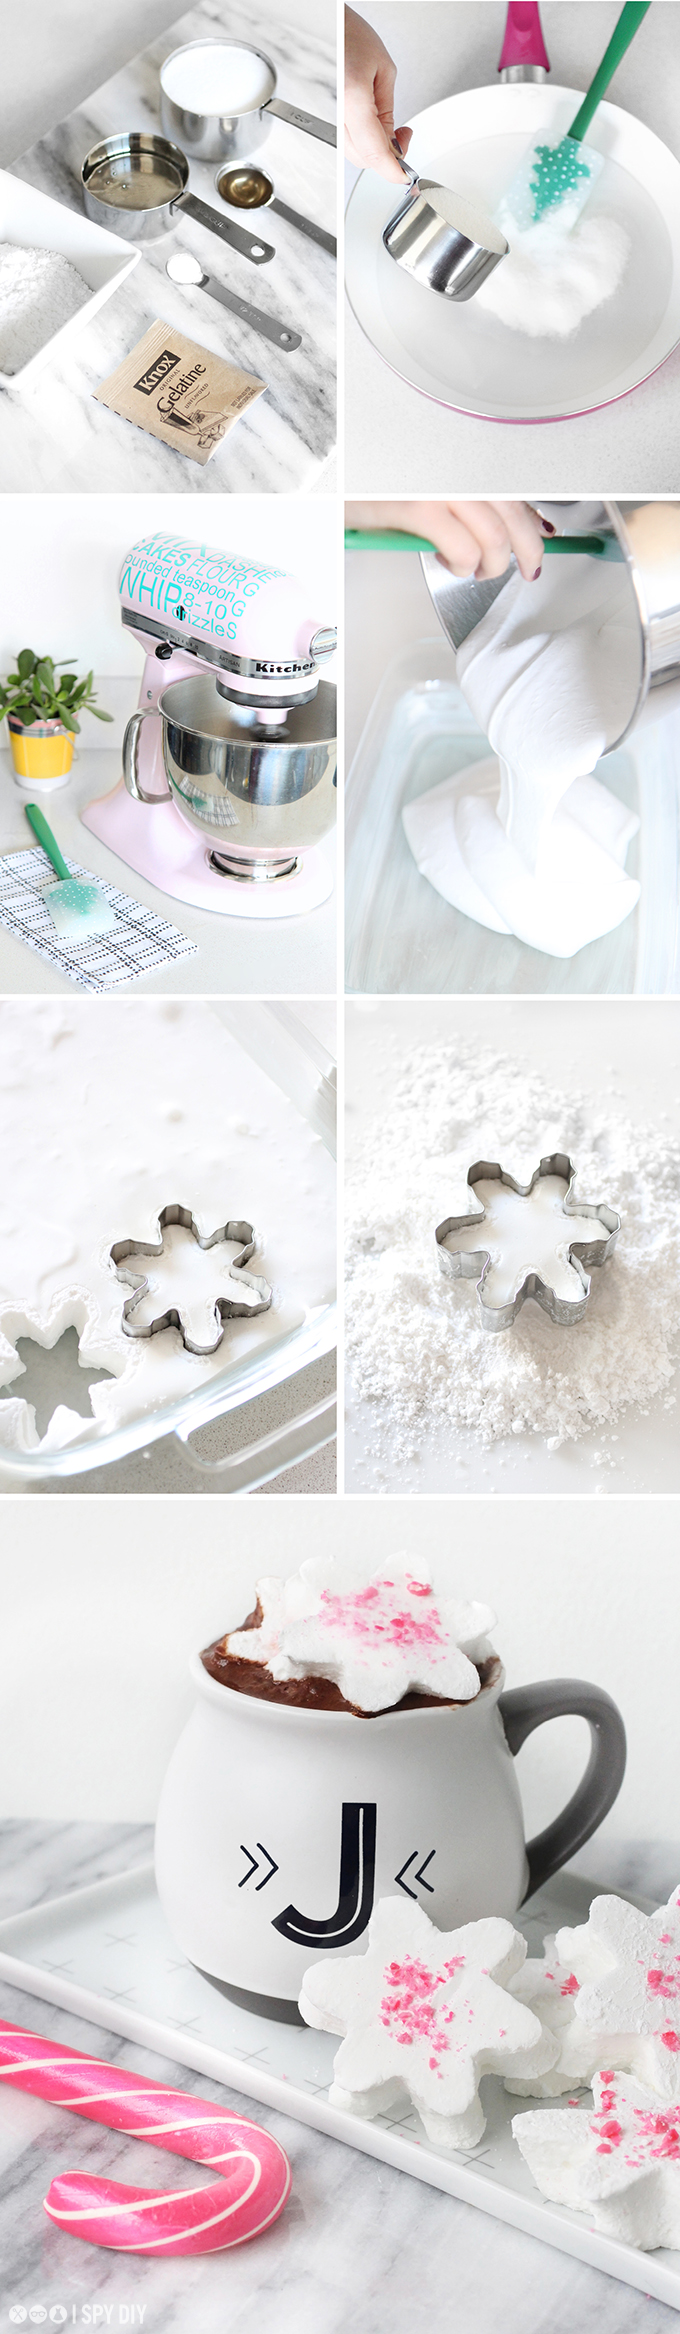 Ispydiy_marshmallows6